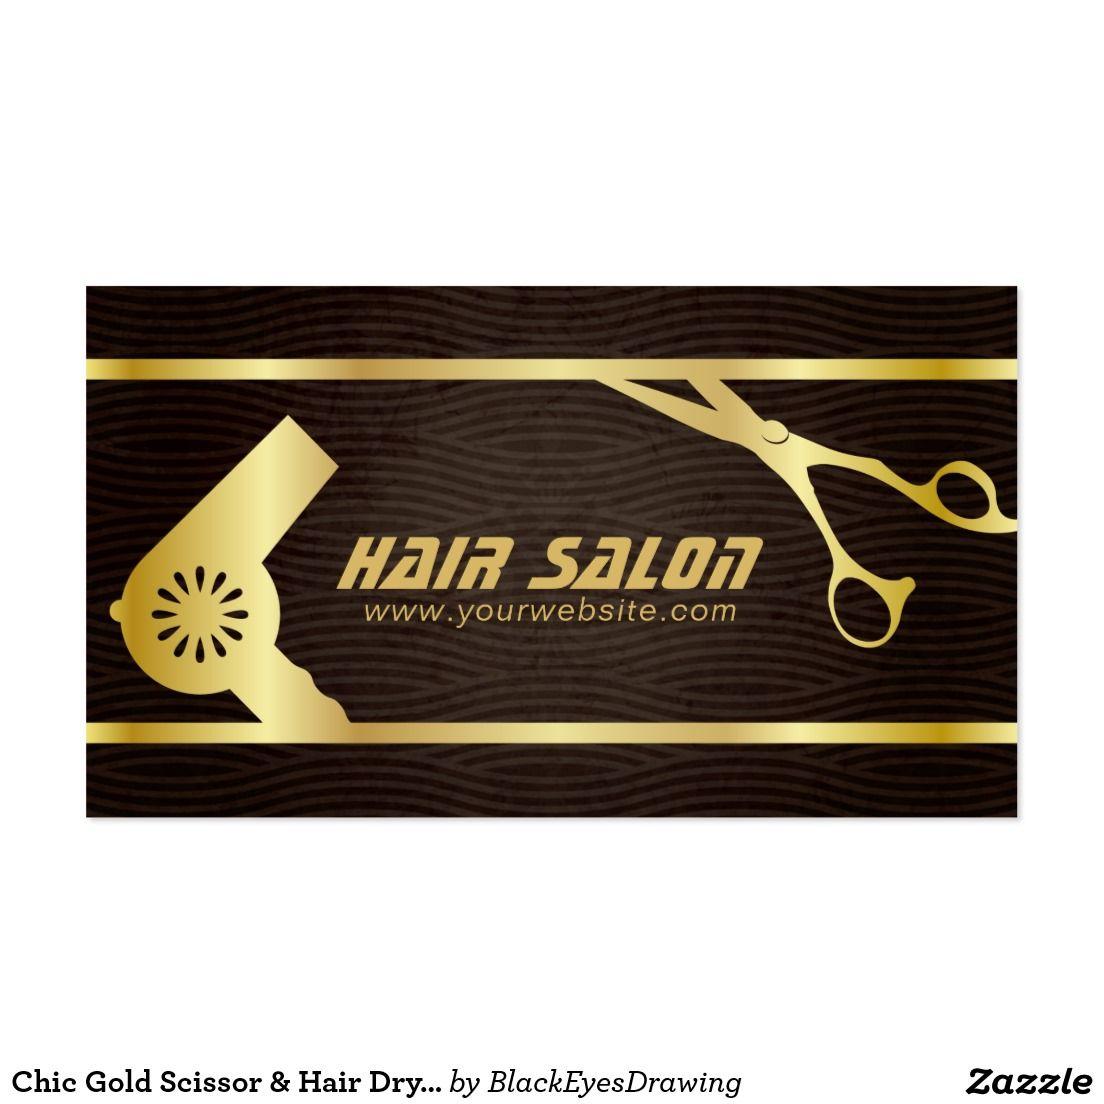 chic gold scissor hair dryer makeup hair salon business cards